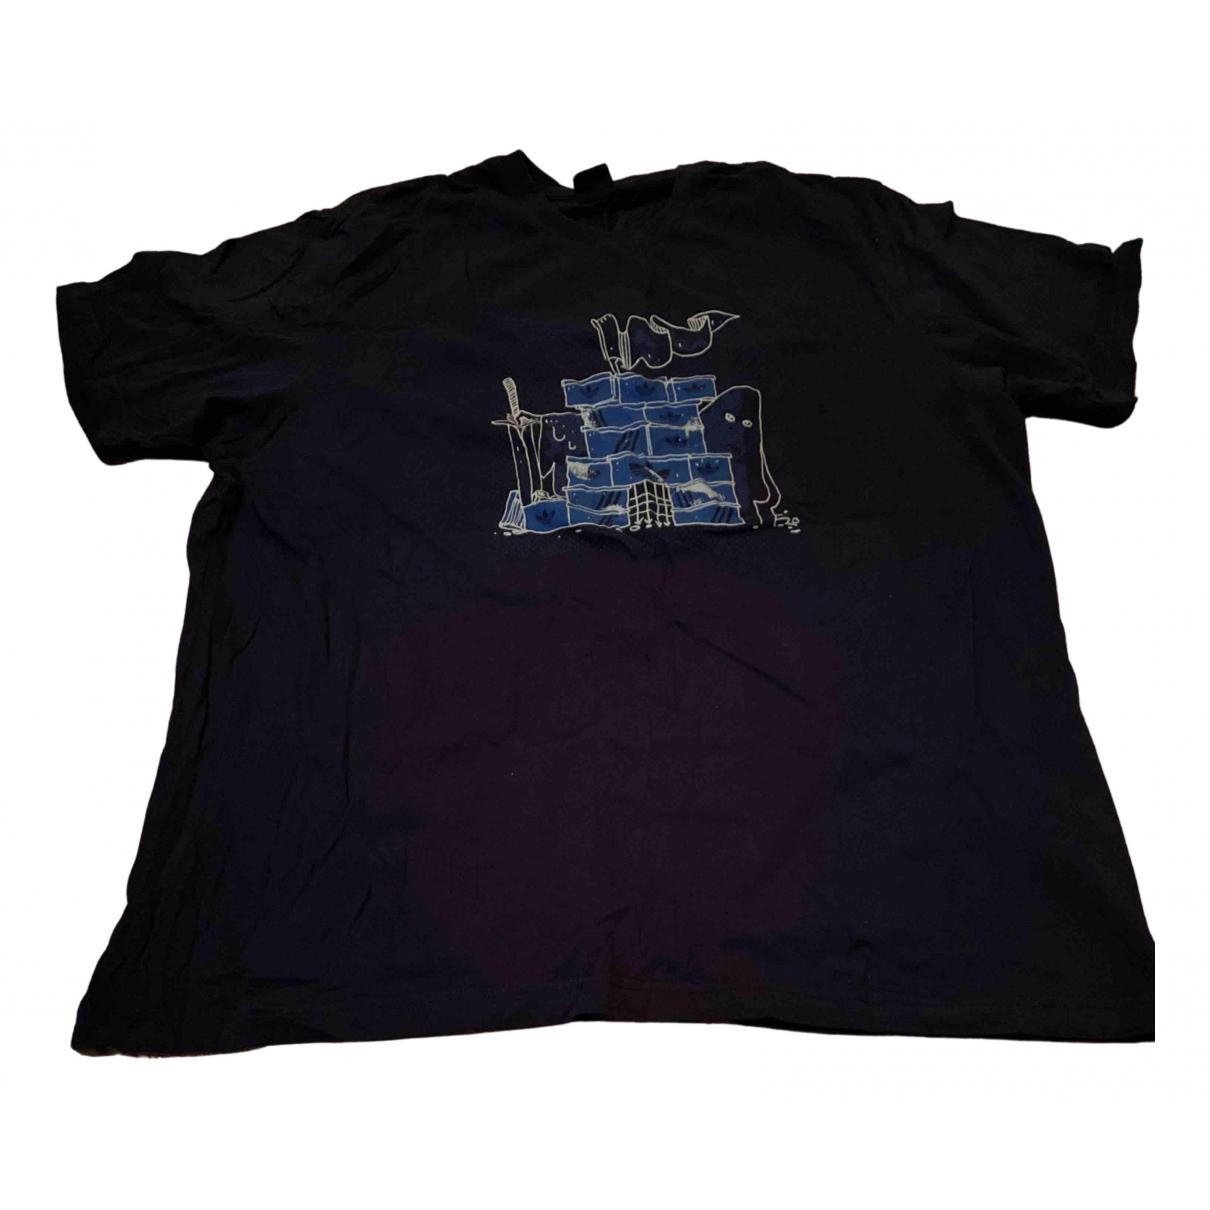 Adidas N Navy Cotton T-shirts for Men XXL International